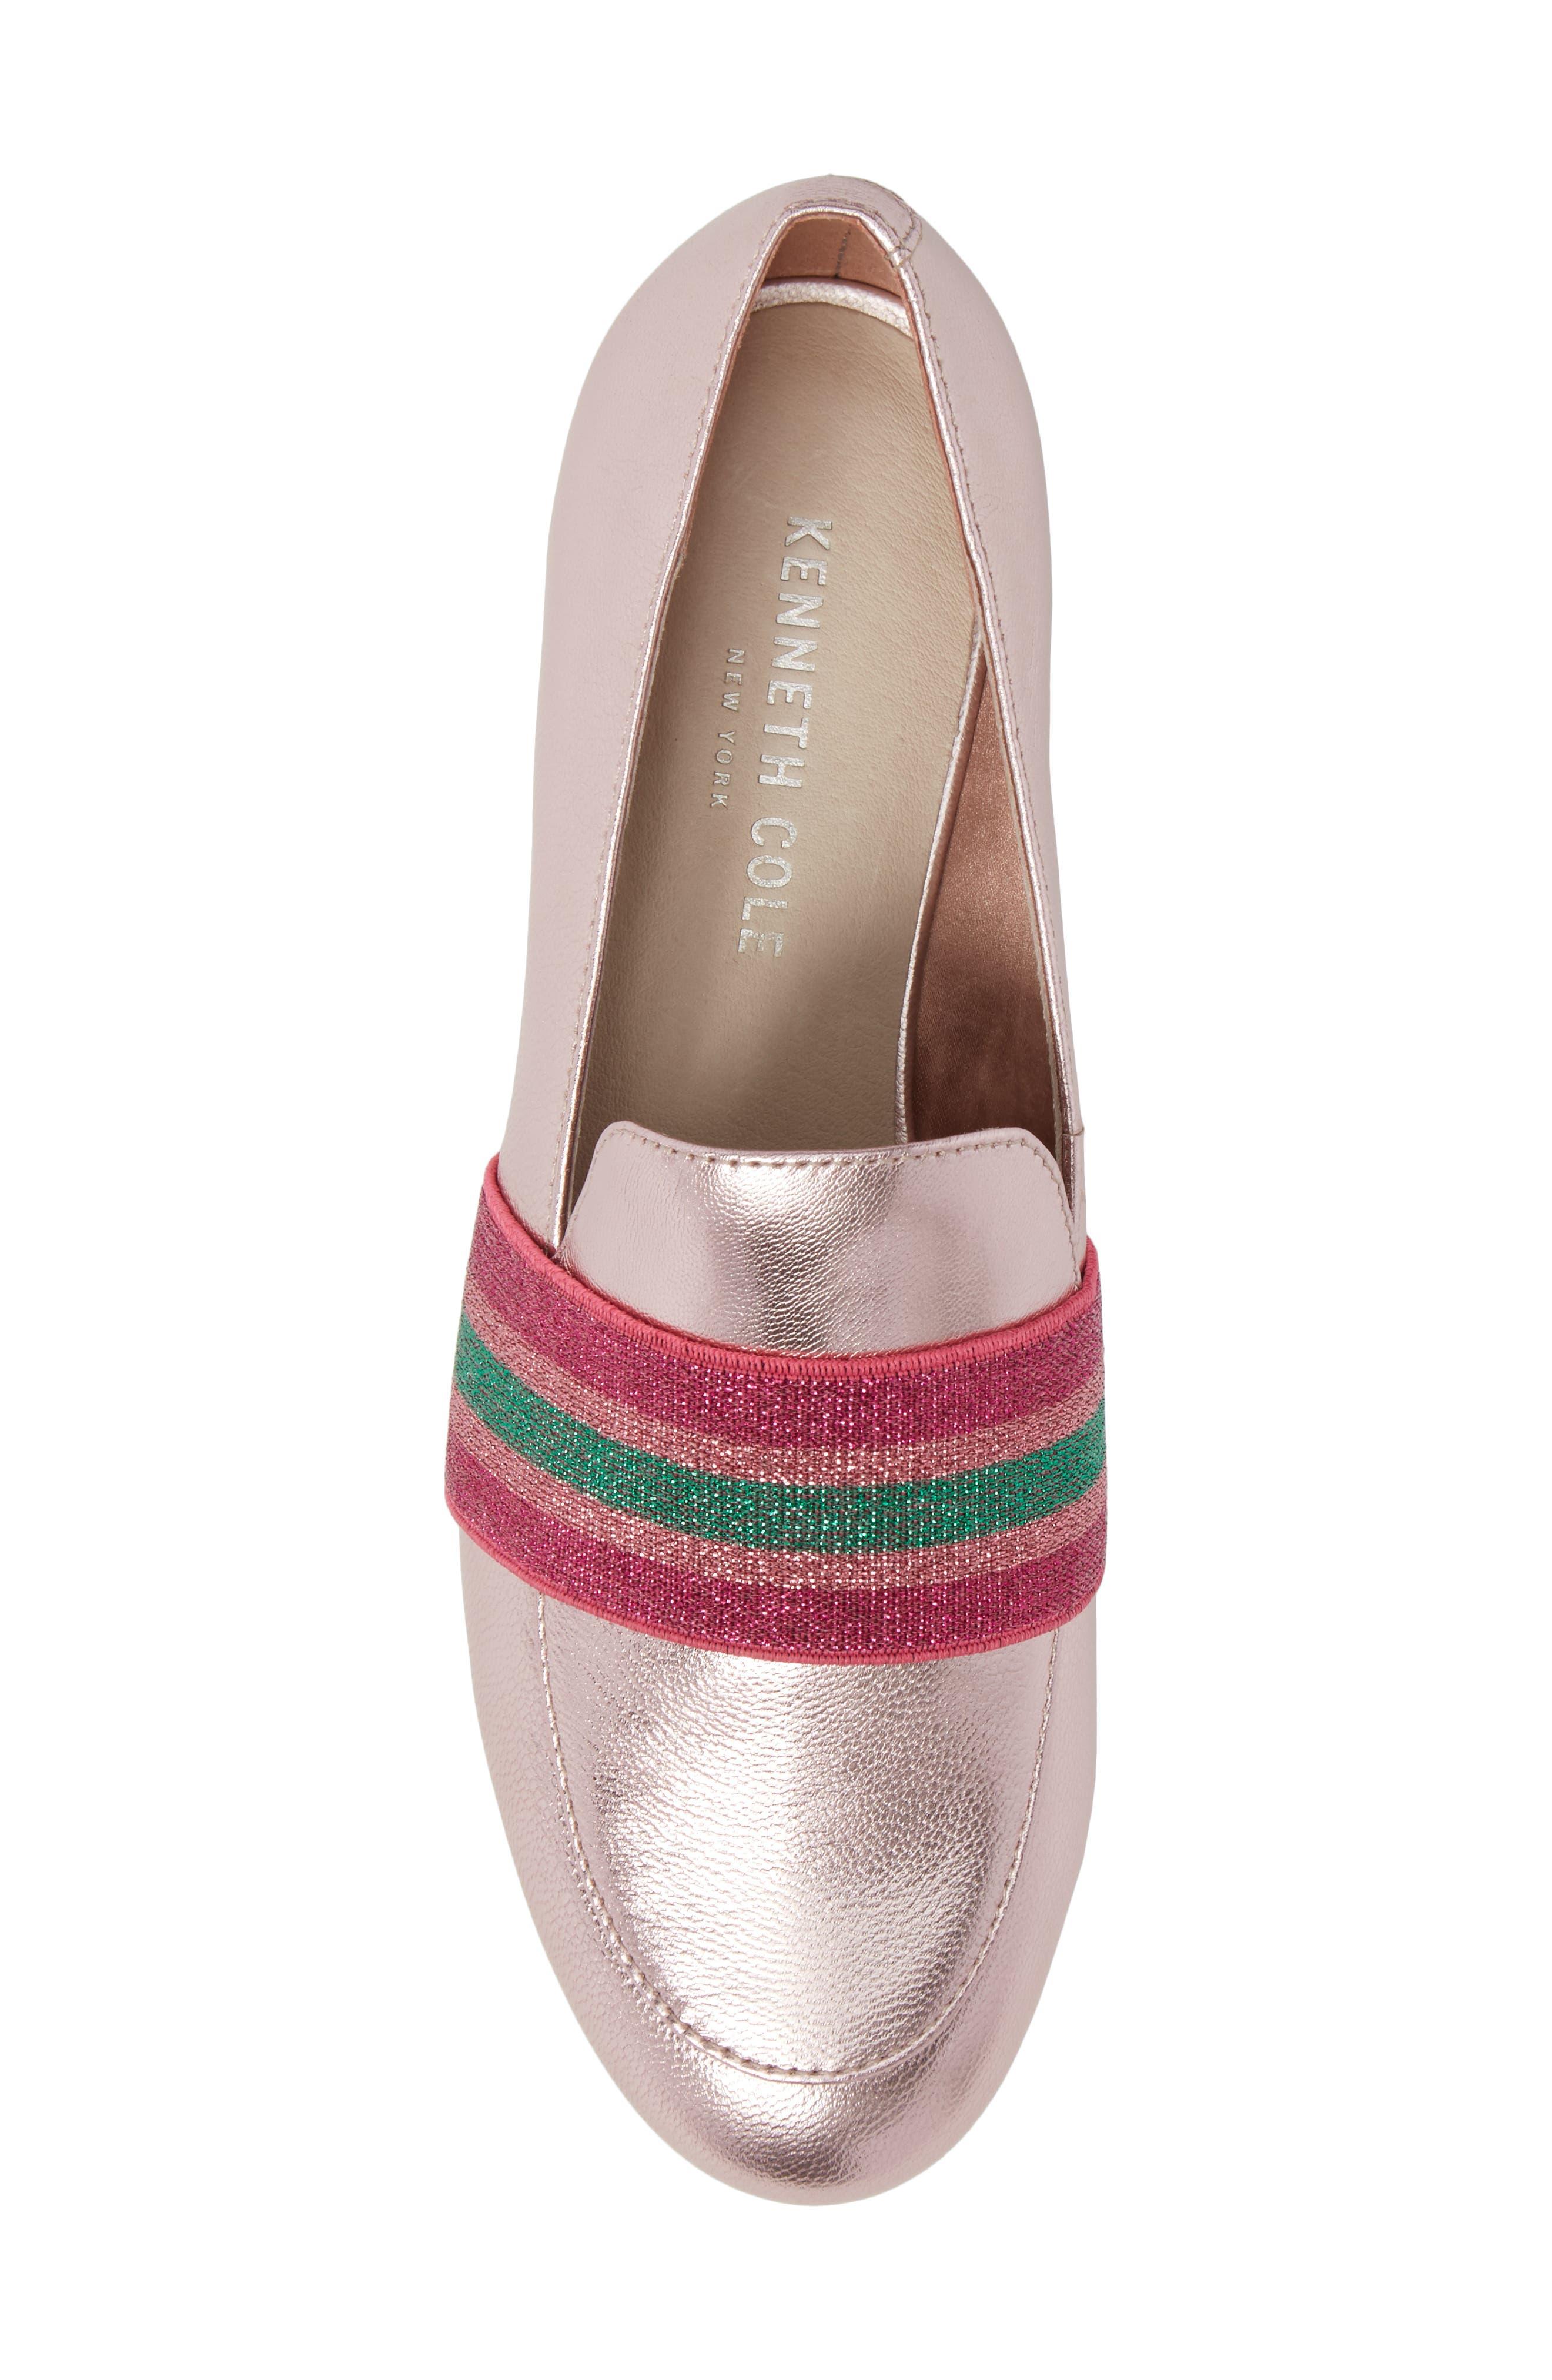 Walden Loafer,                             Alternate thumbnail 5, color,                             Pink Metallic Leather